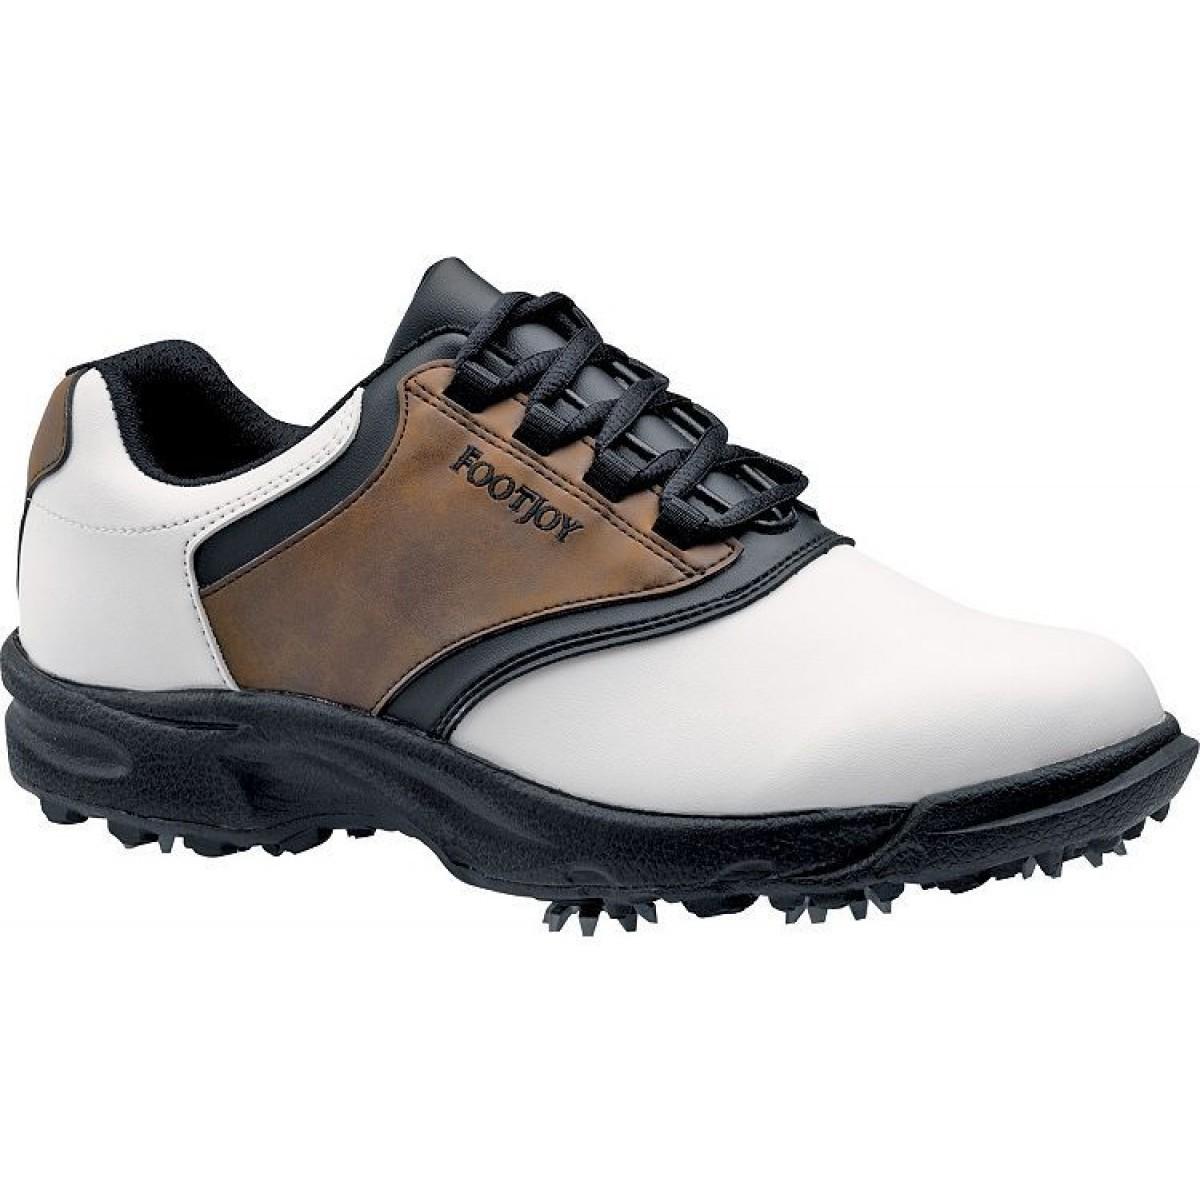 Footjoy Greenjoys Zapatos Blancocafé Zapatos Footjoy Greenjoys Blancocafé Hombre lJKTF1c3